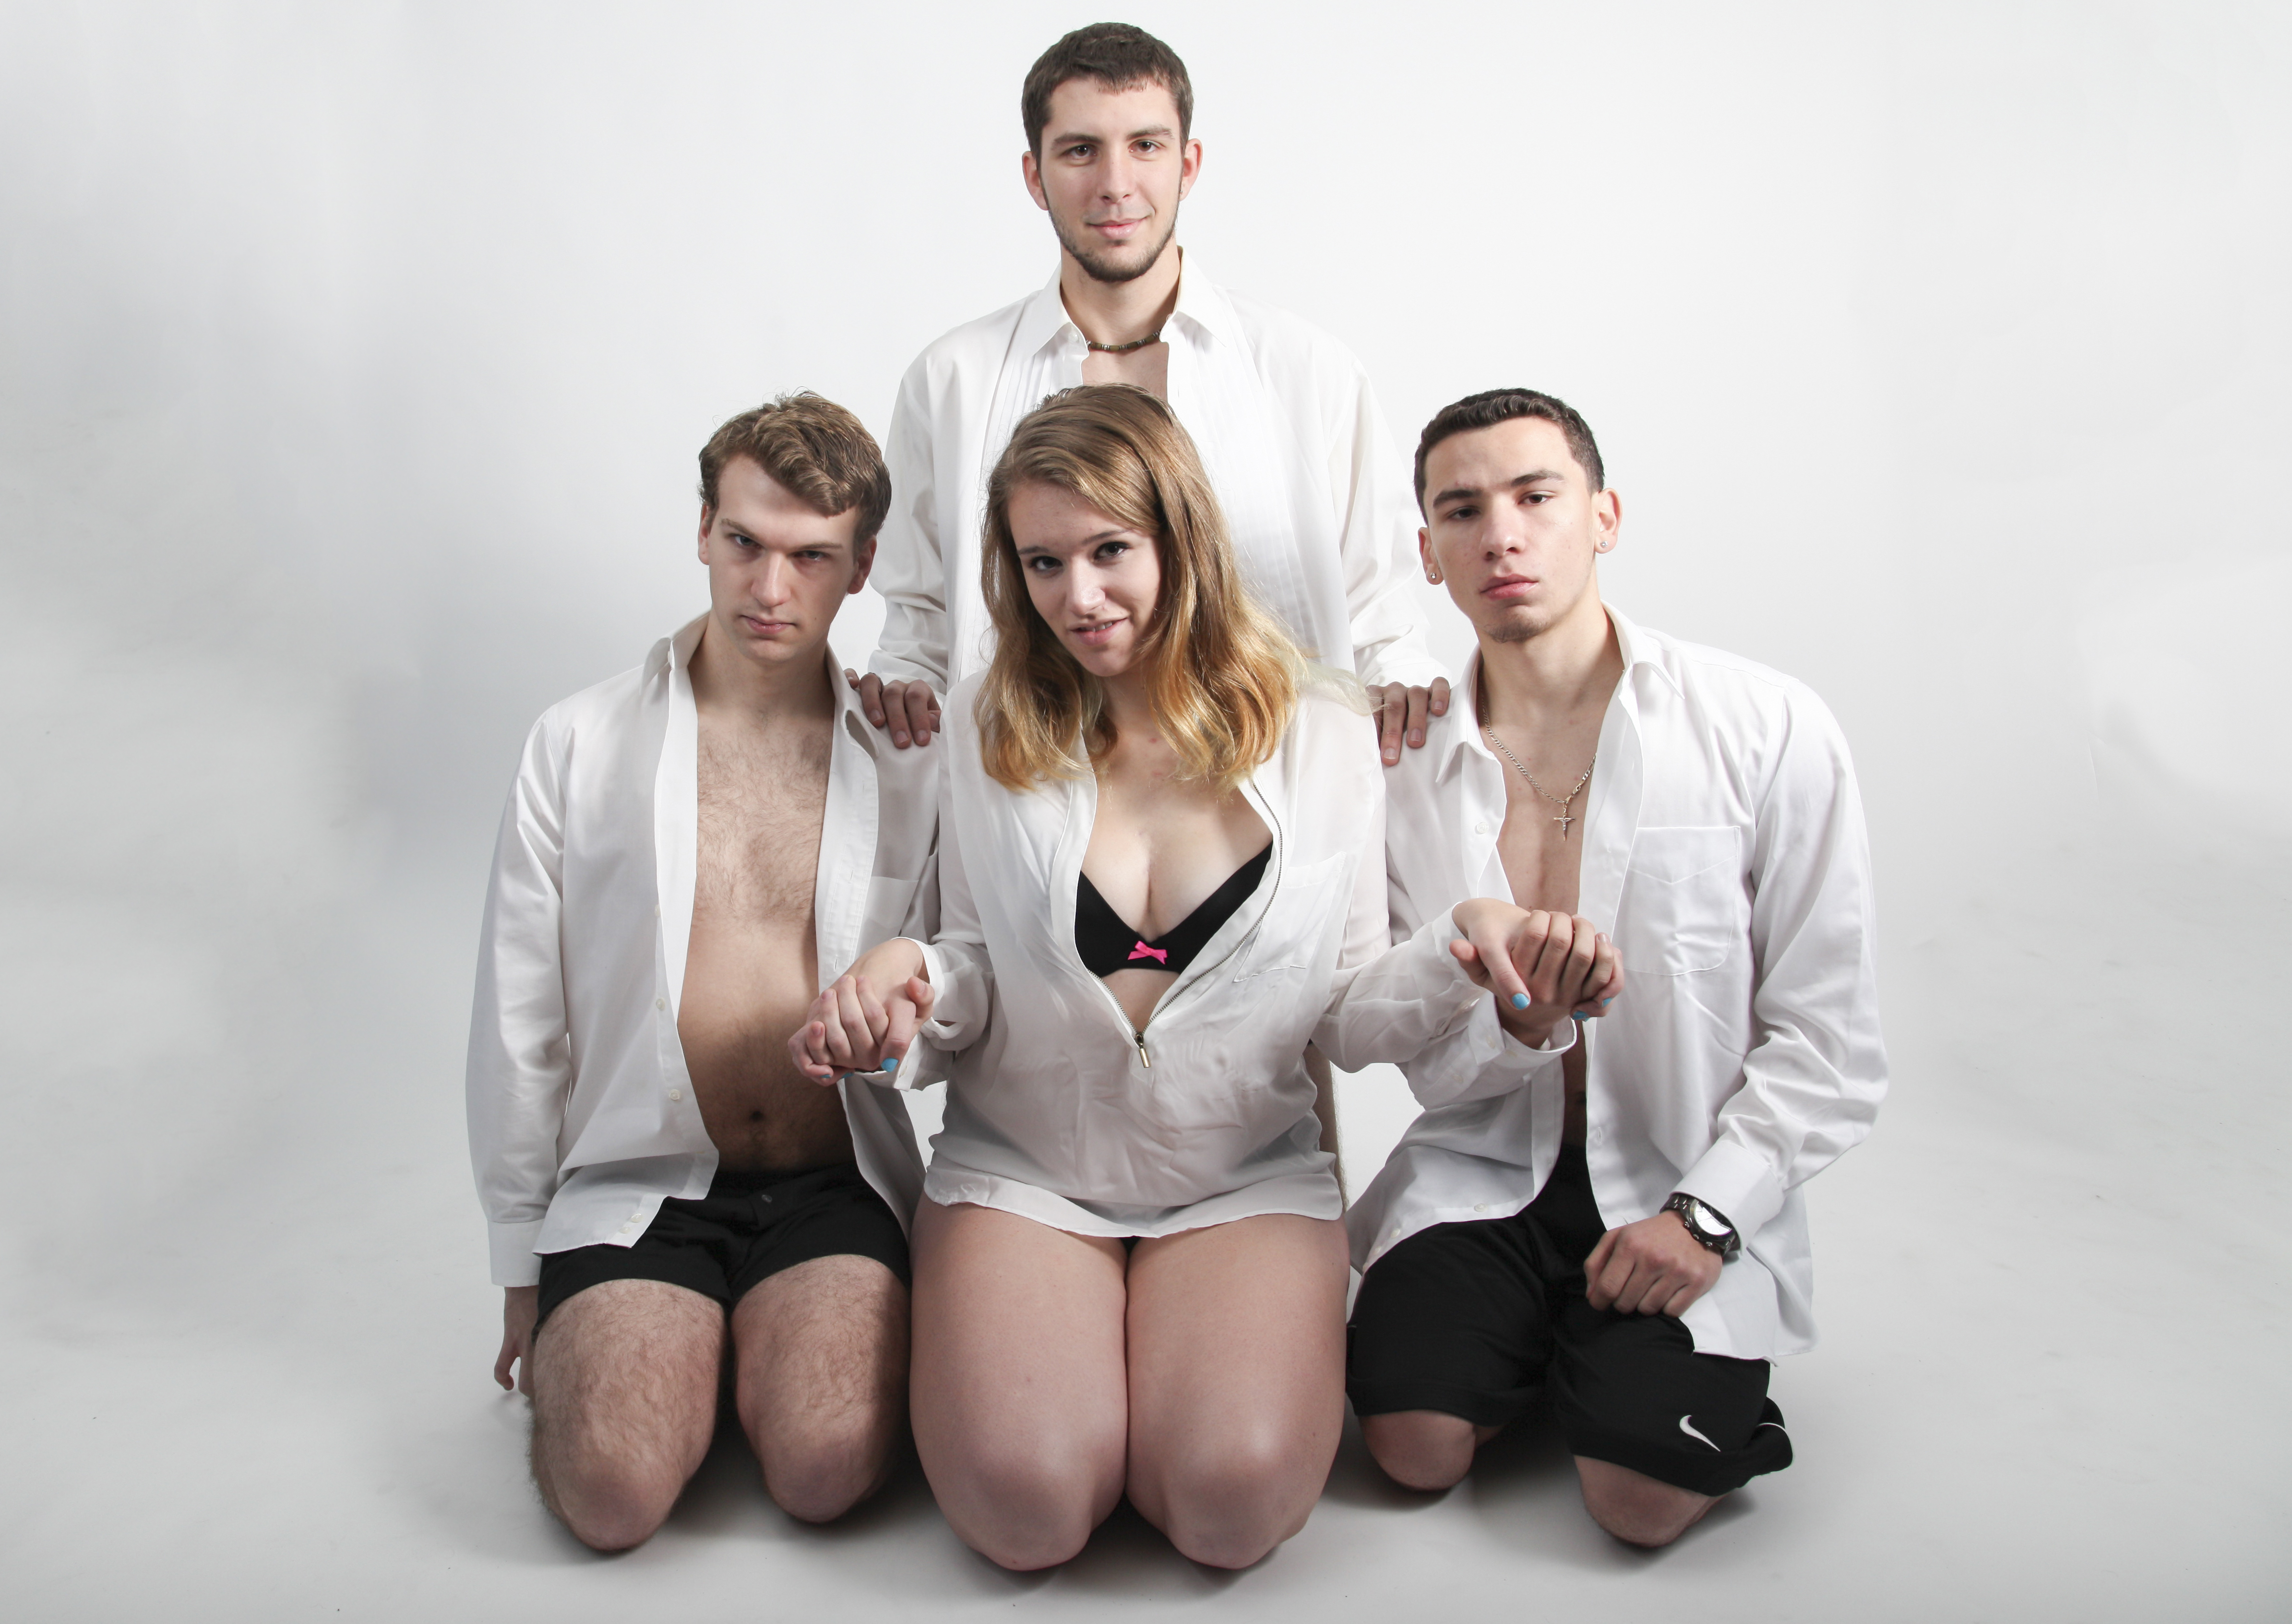 human sexuality, slut-shaming